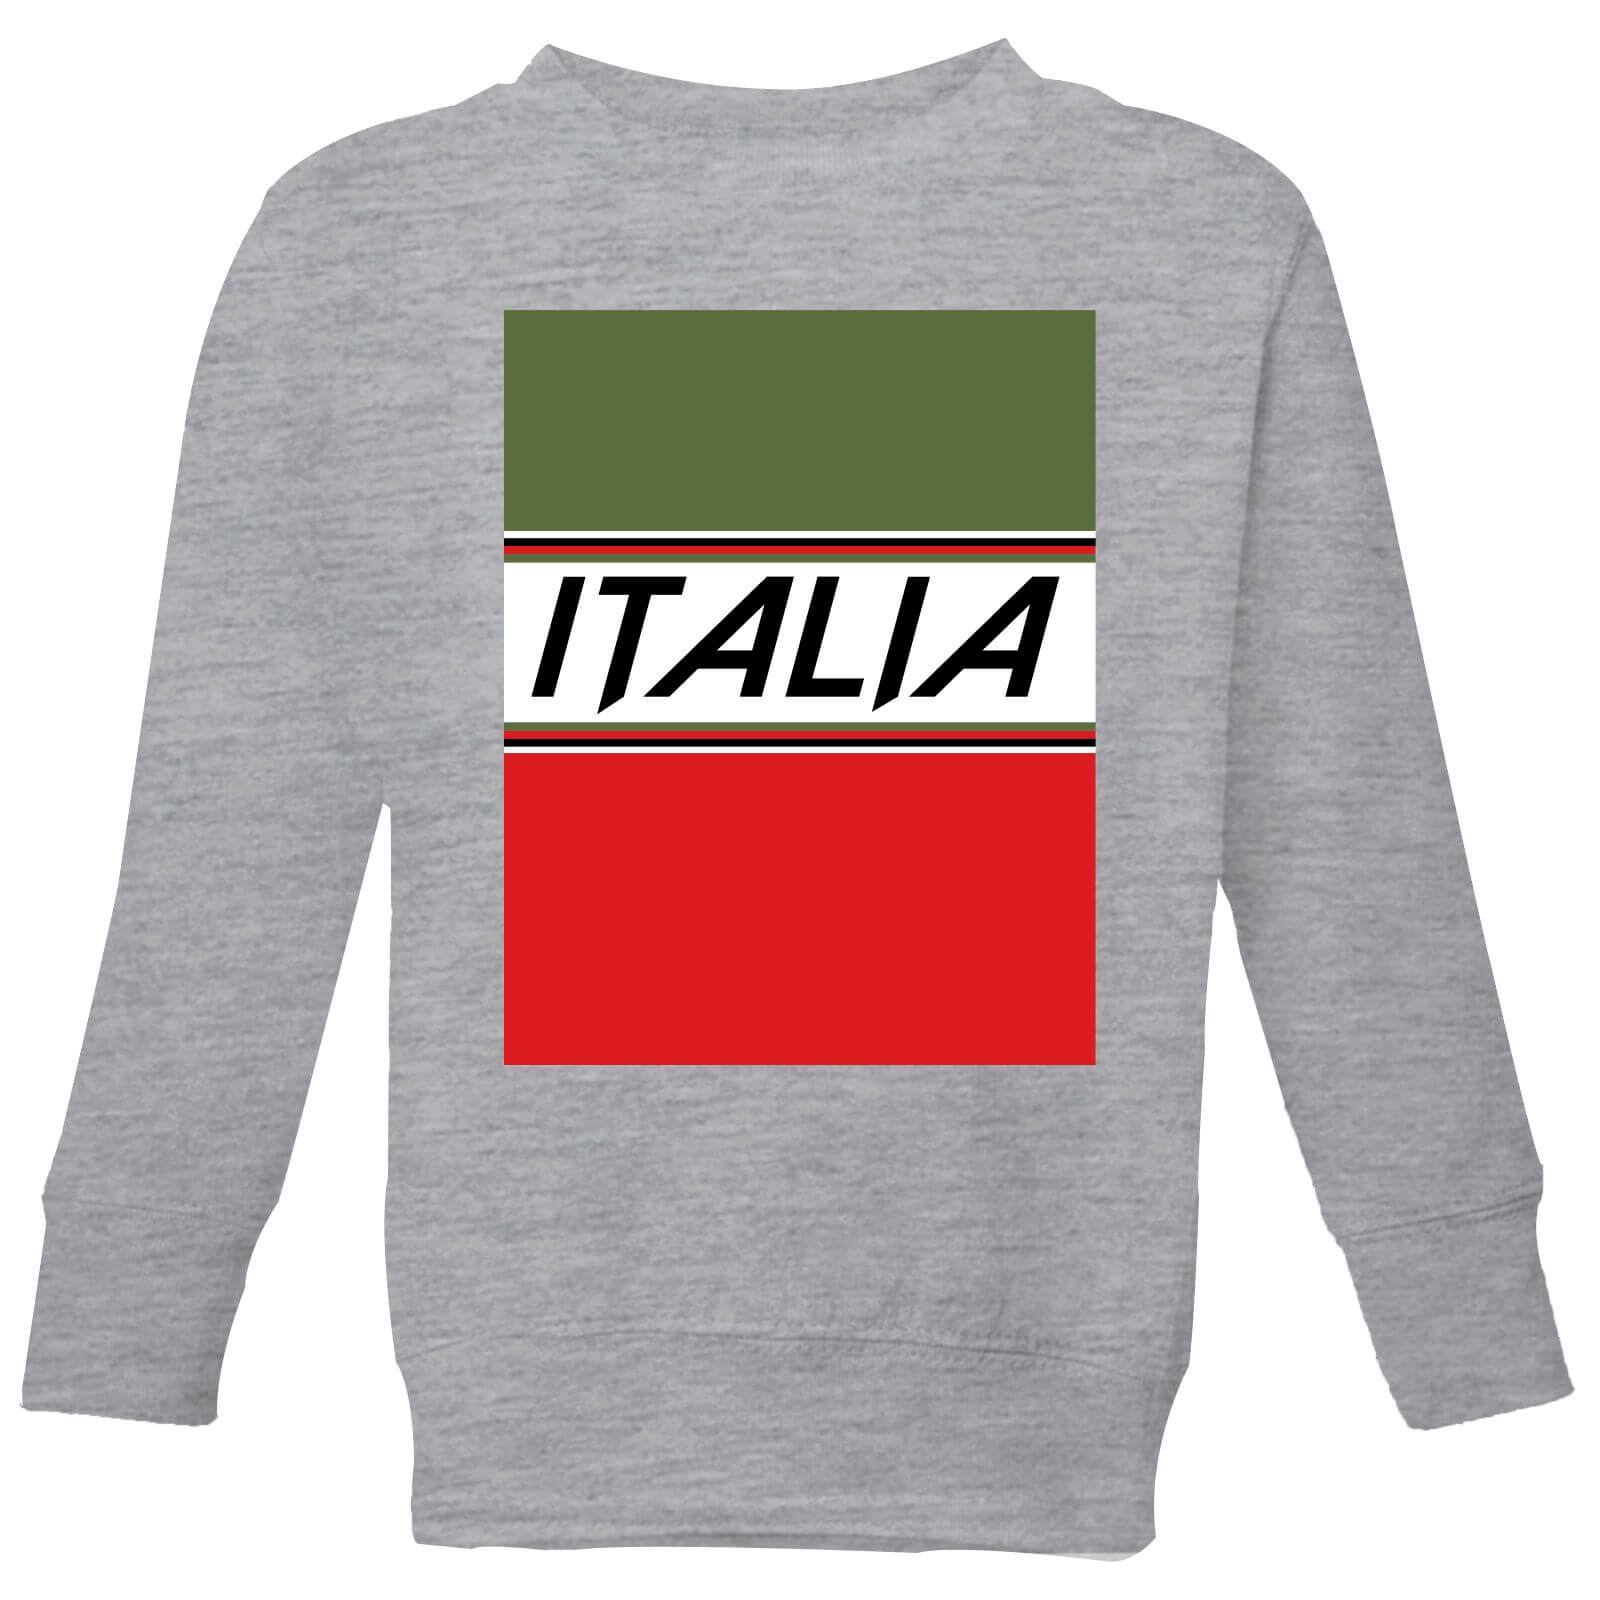 Summit Finish Italia Kids' Sweatshirt - Grey - 5-6 Years - Grey